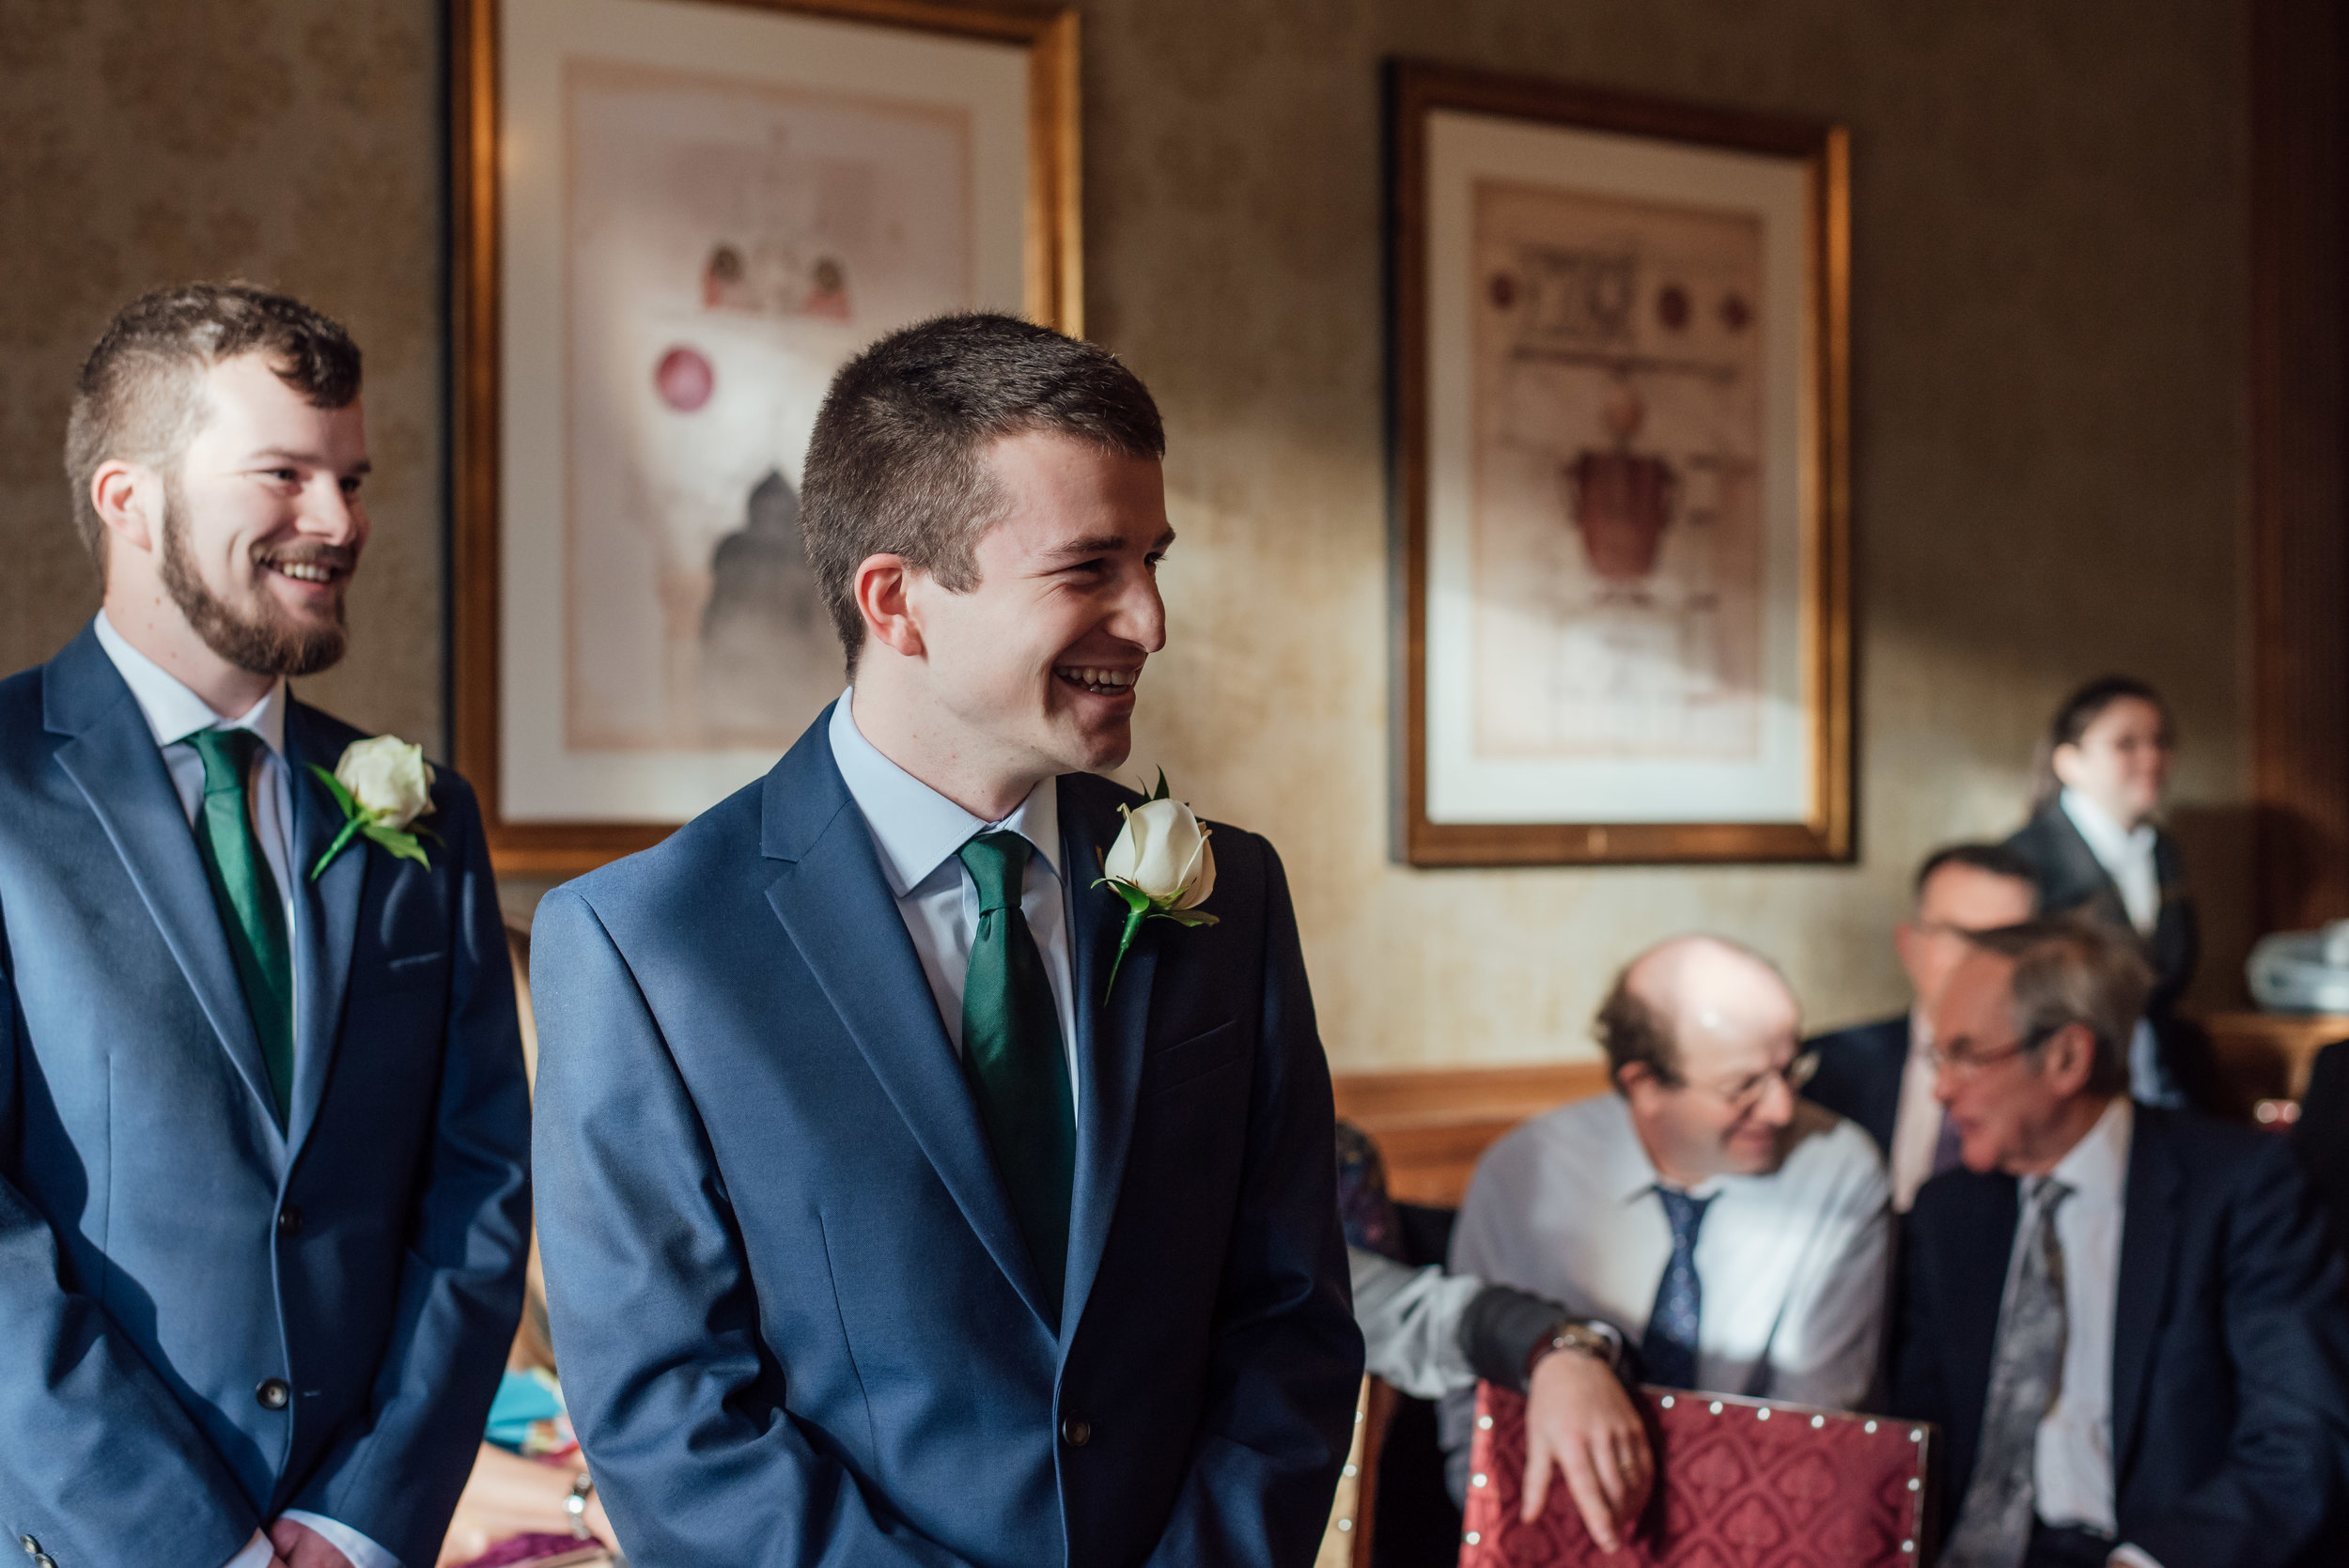 Hampshire-wedding-photographer-hampshire / Amy-James-photography / tylney-hall-wedding-hook-hampshire /hampshire-wedding-venue / fleet-wedding-photographer-farnborough / natural-wedding-photographer / fun-wedding-photographer / documentary-wedding-photographer / Autumn-Wedding-inspiration